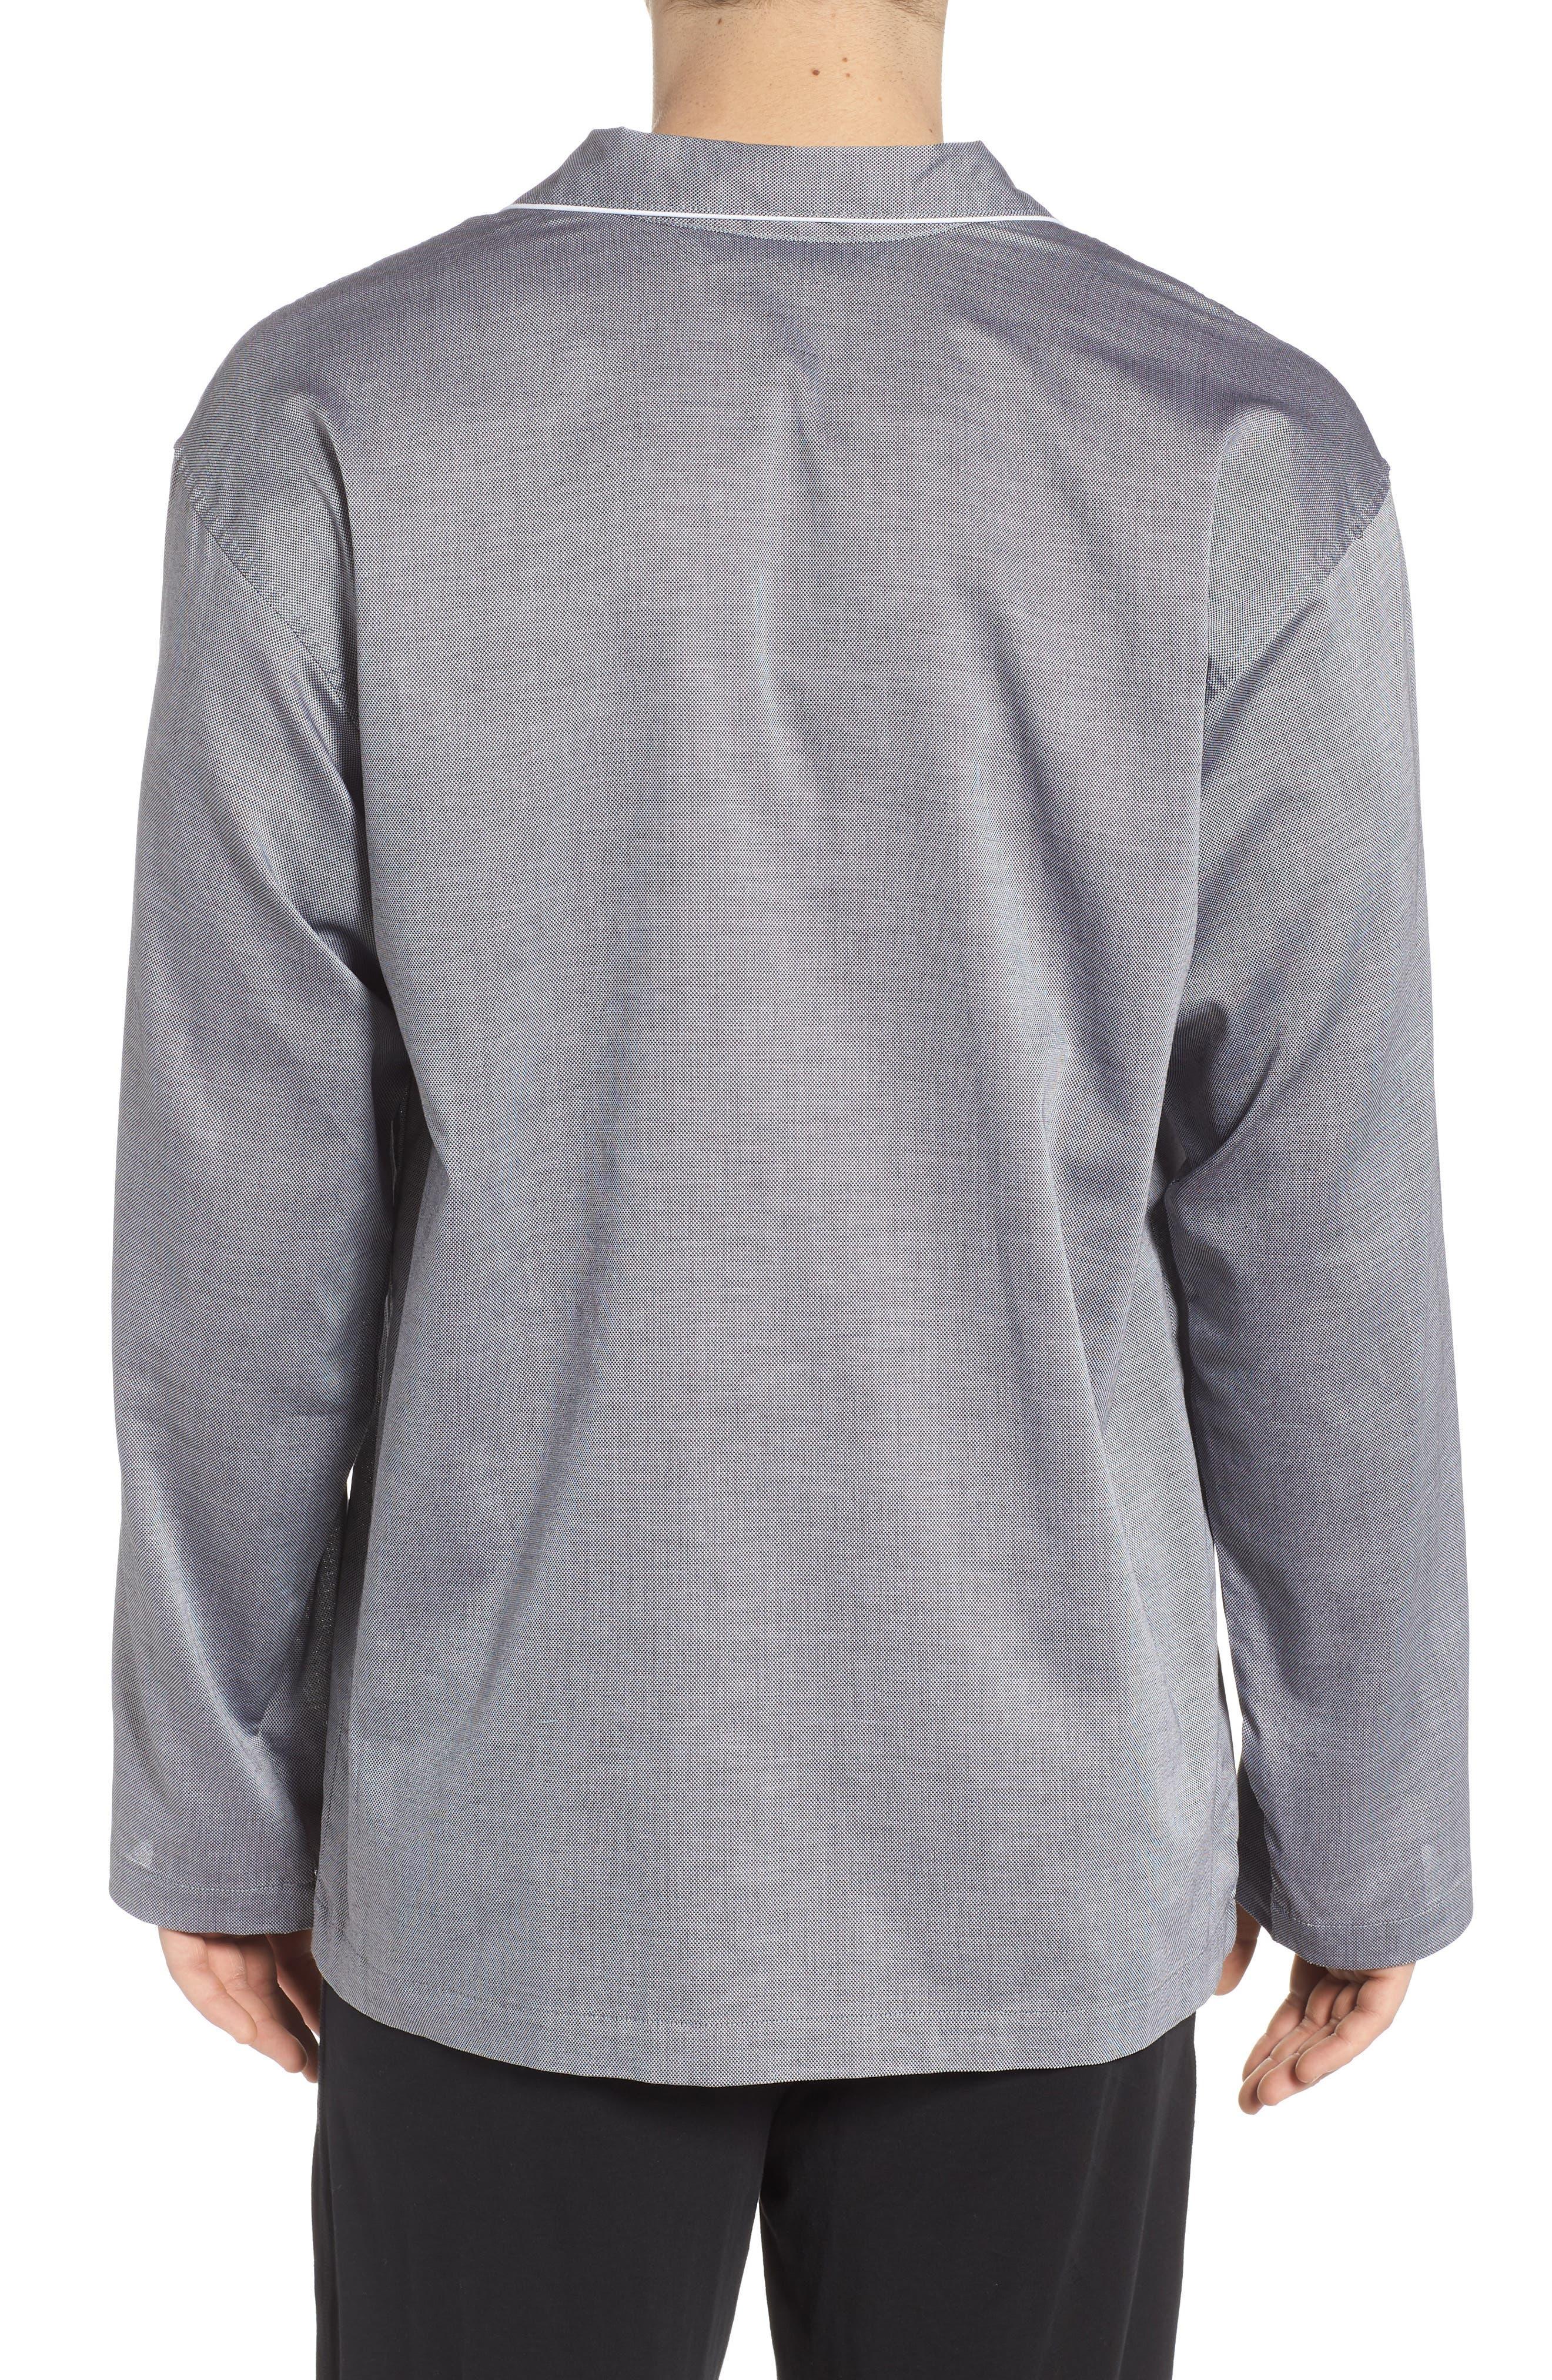 Pajama Top,                             Alternate thumbnail 3, color,                             BLACK ROYAL OXFORD